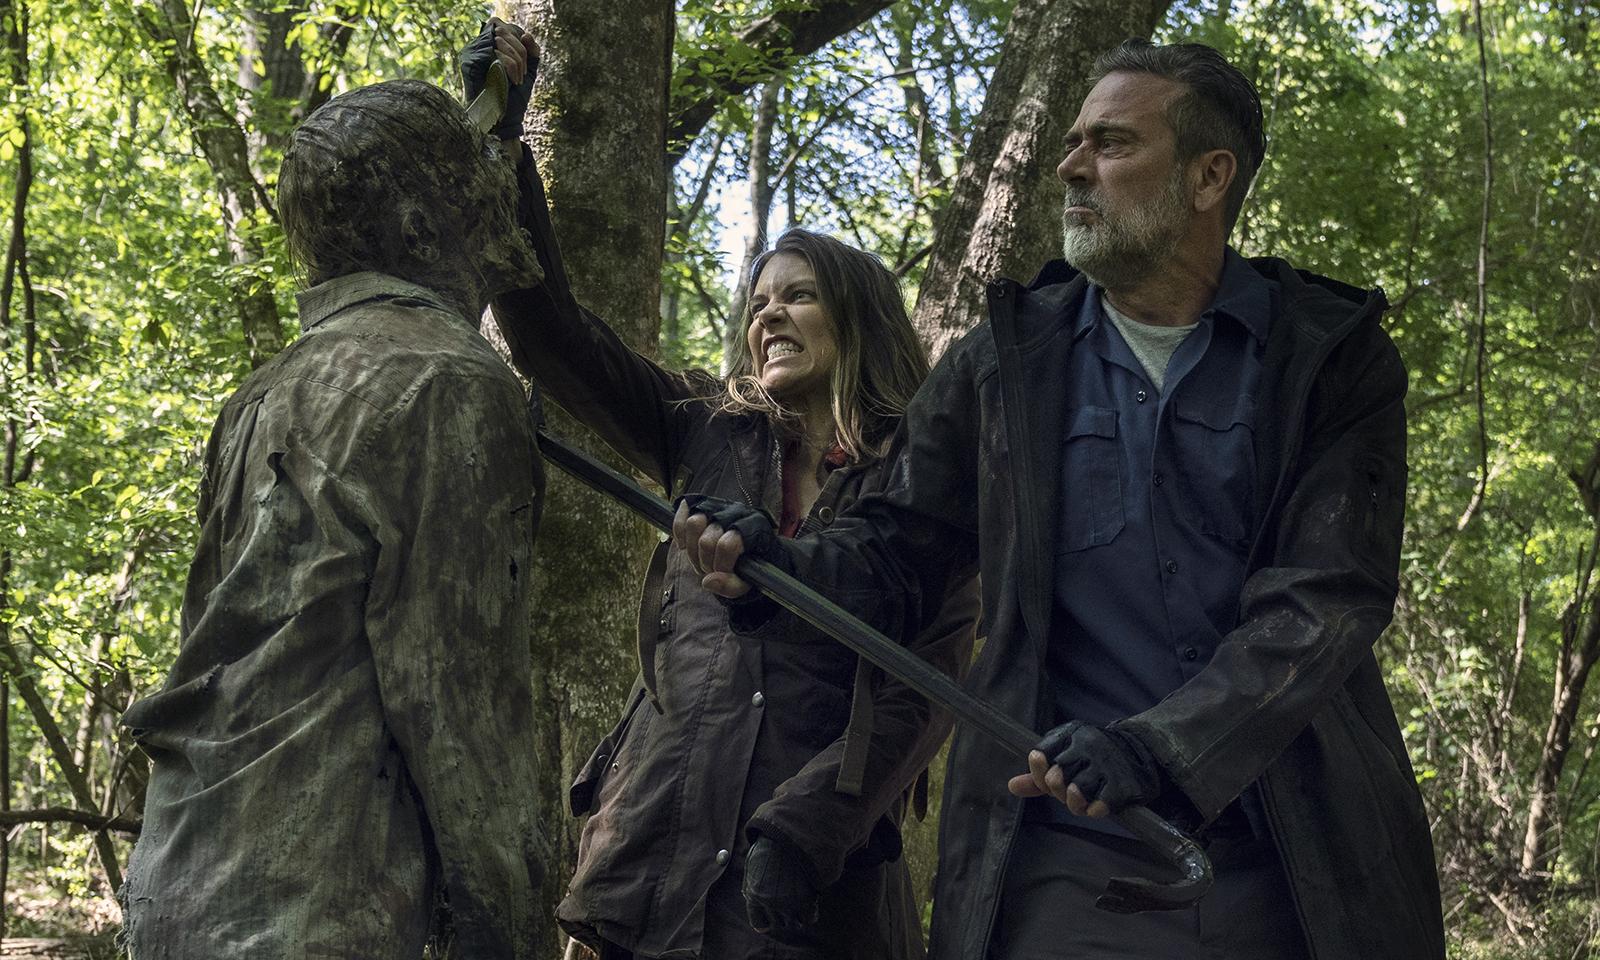 Maggie e Negan matando um zumbi juntos na floresta no episódio 5 da 11ª temporada de The Walking Dead.